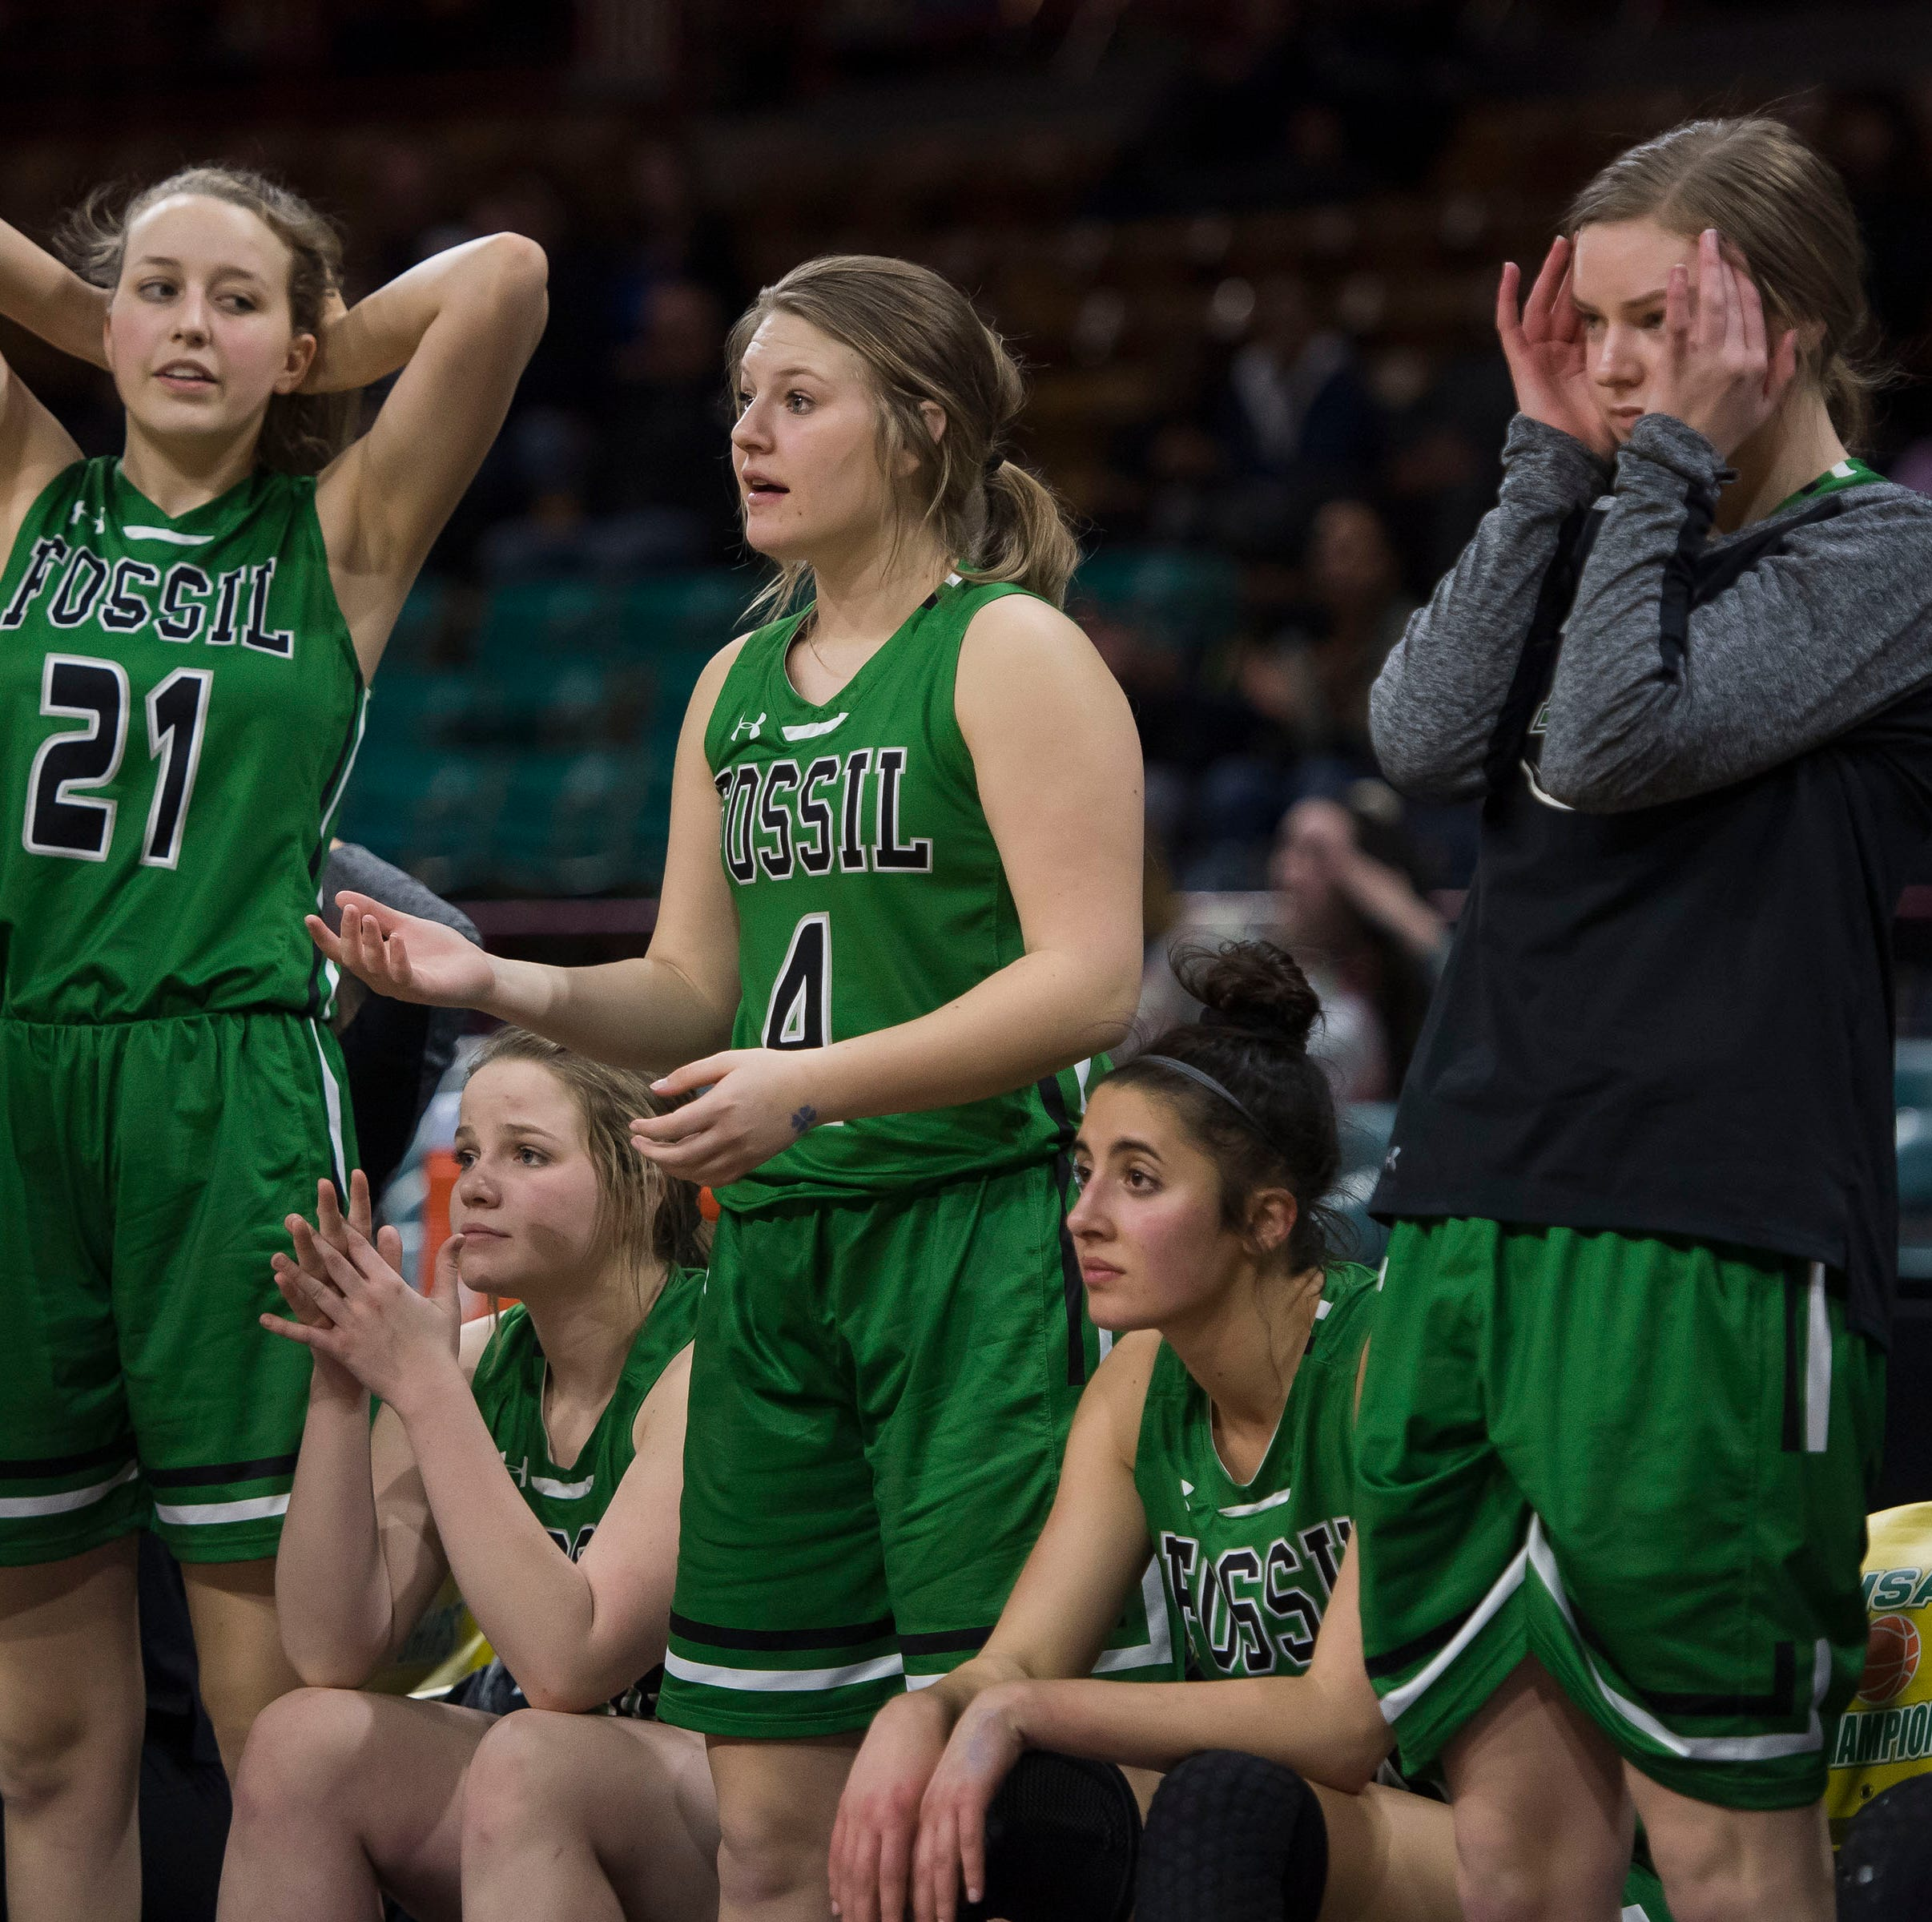 Fossil Ridge's basketball run ends in heartbreaking quarterfinal loss